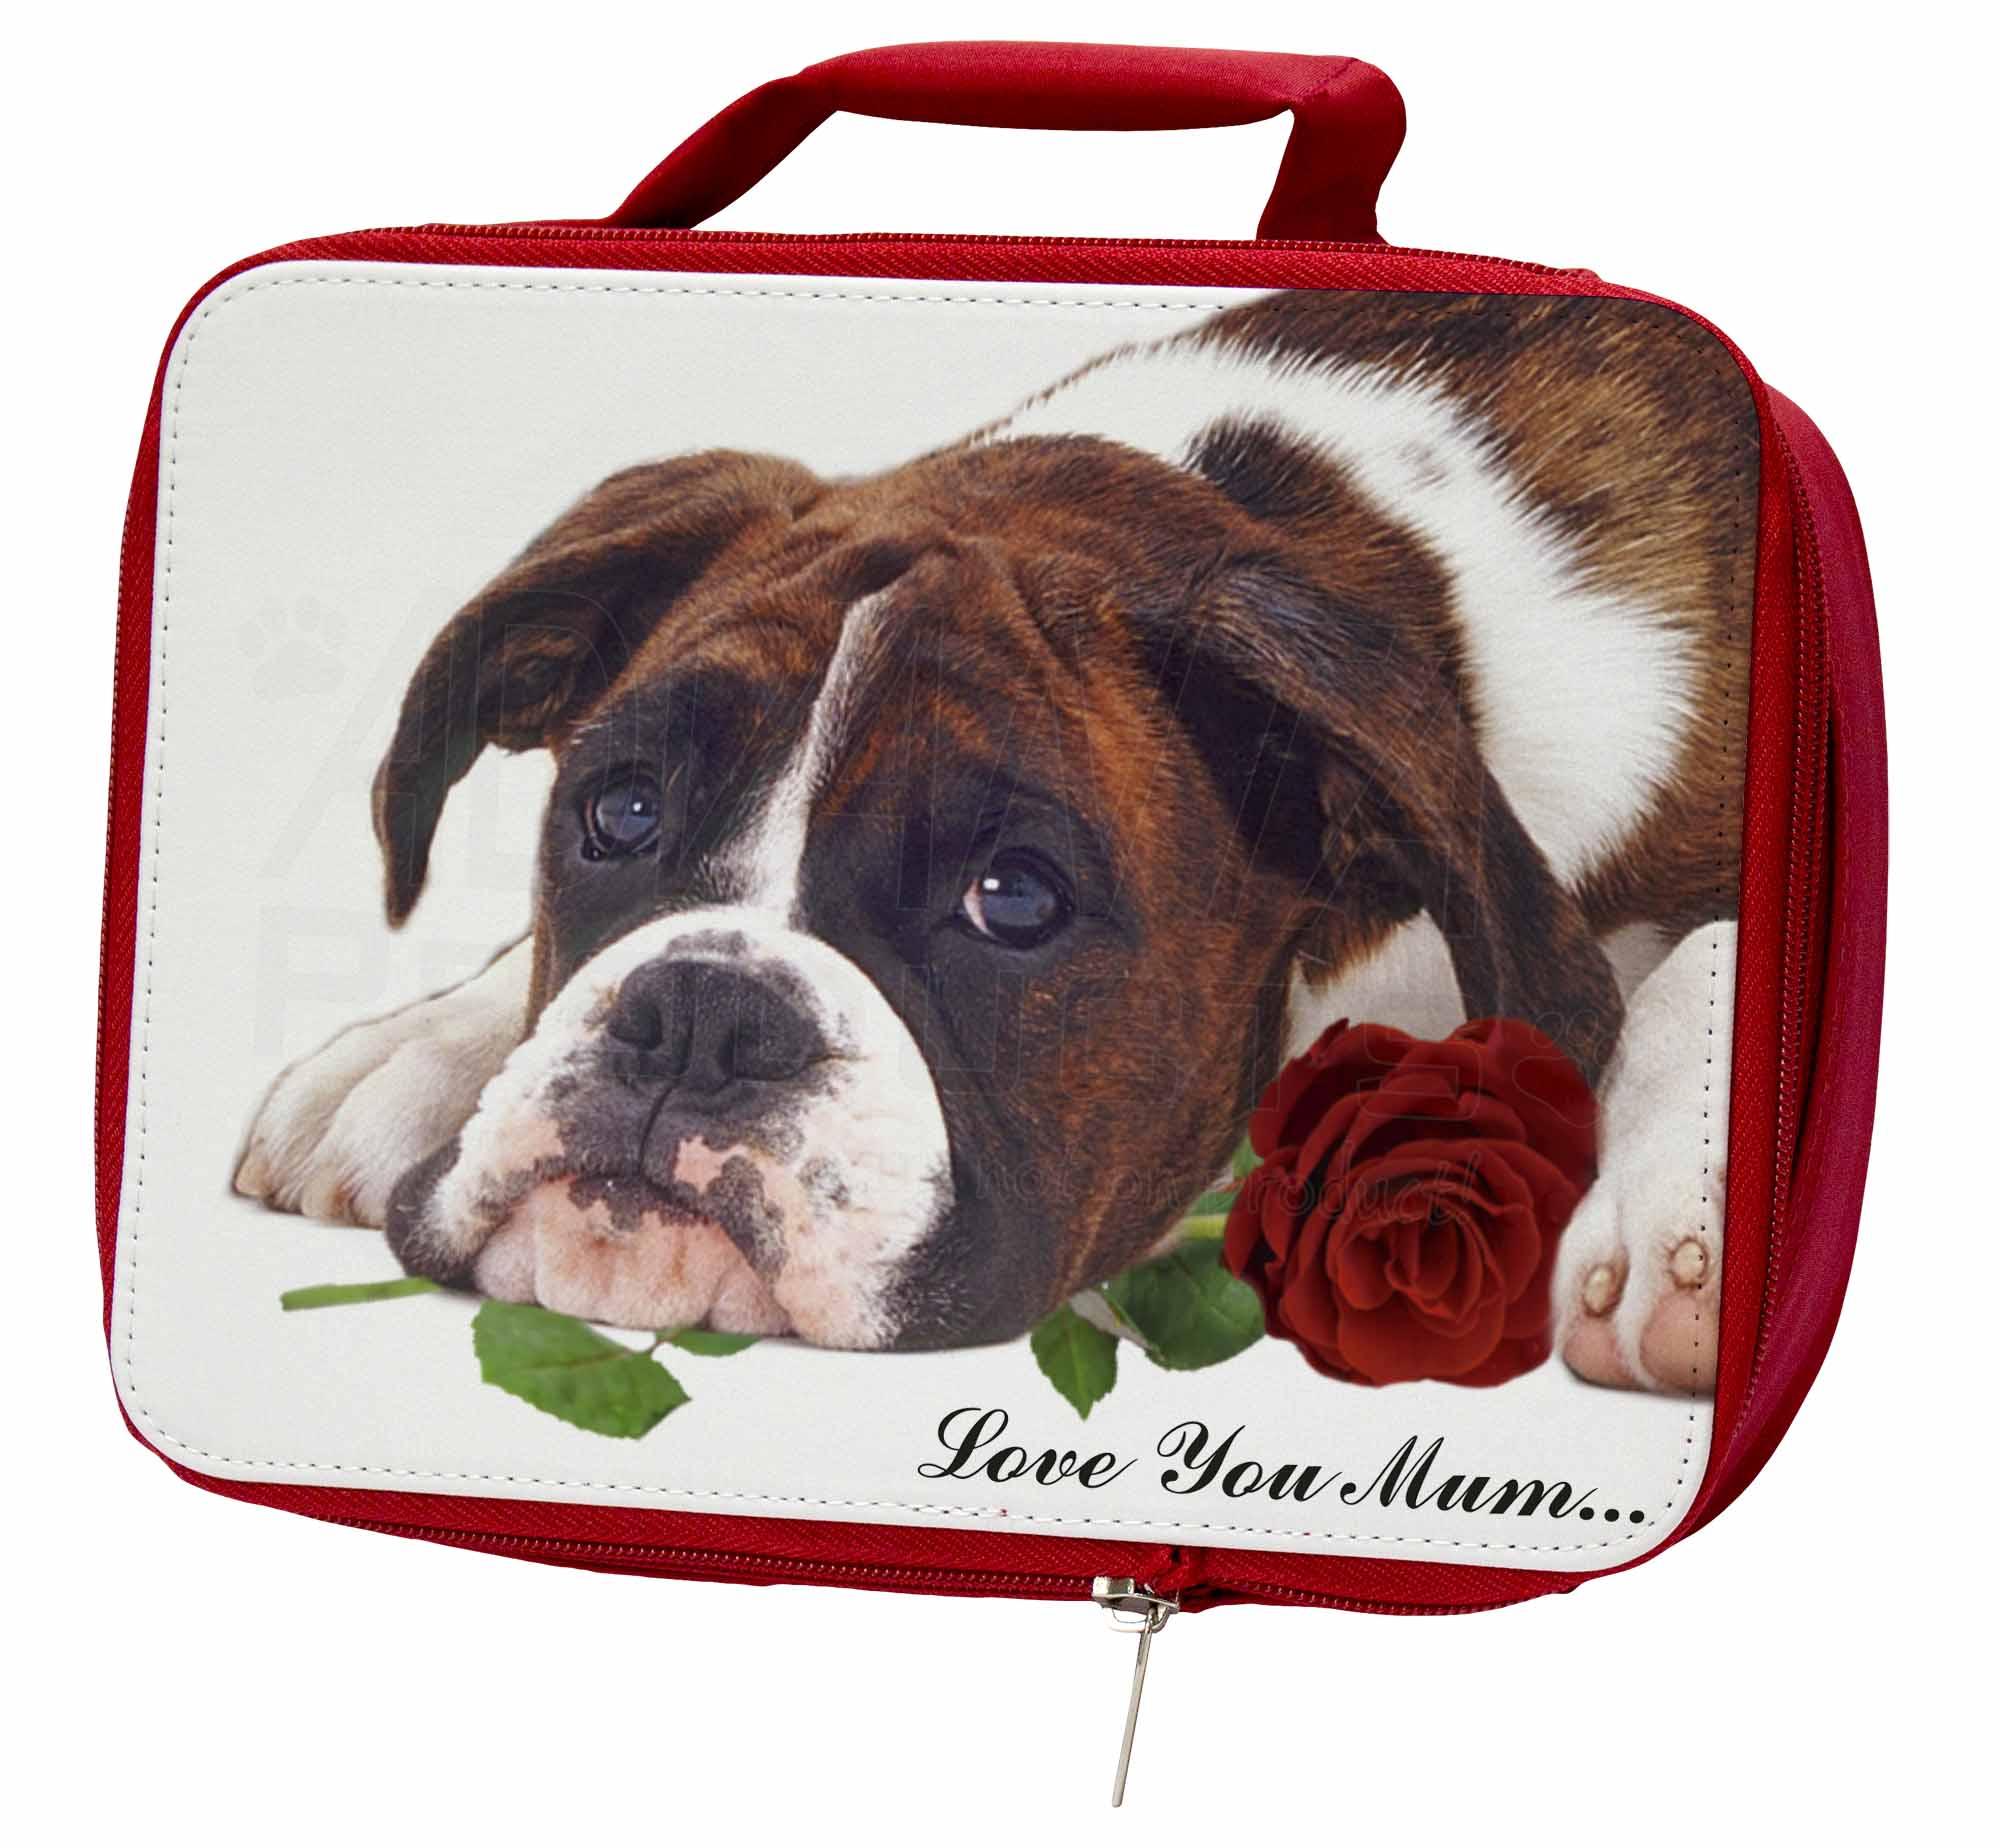 boxer hund rose 39 liebe die sie mama 39 isolierte rote schule jausenbox picn eur 17 89. Black Bedroom Furniture Sets. Home Design Ideas